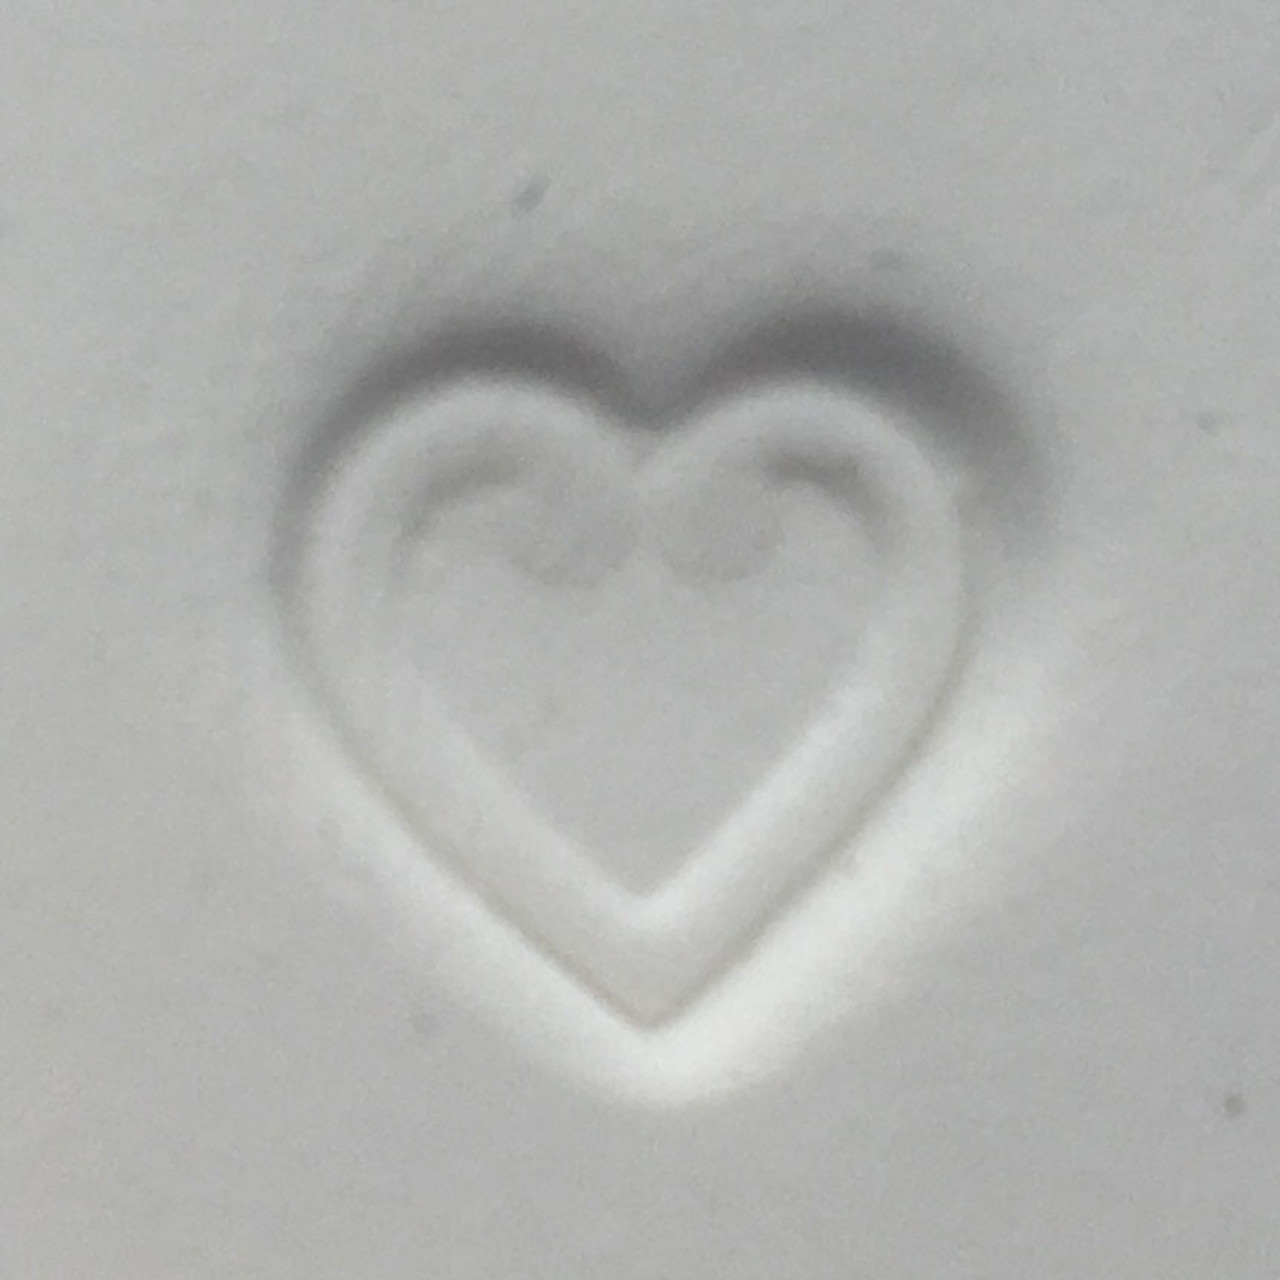 SHEART - Heart Shaped Stamp